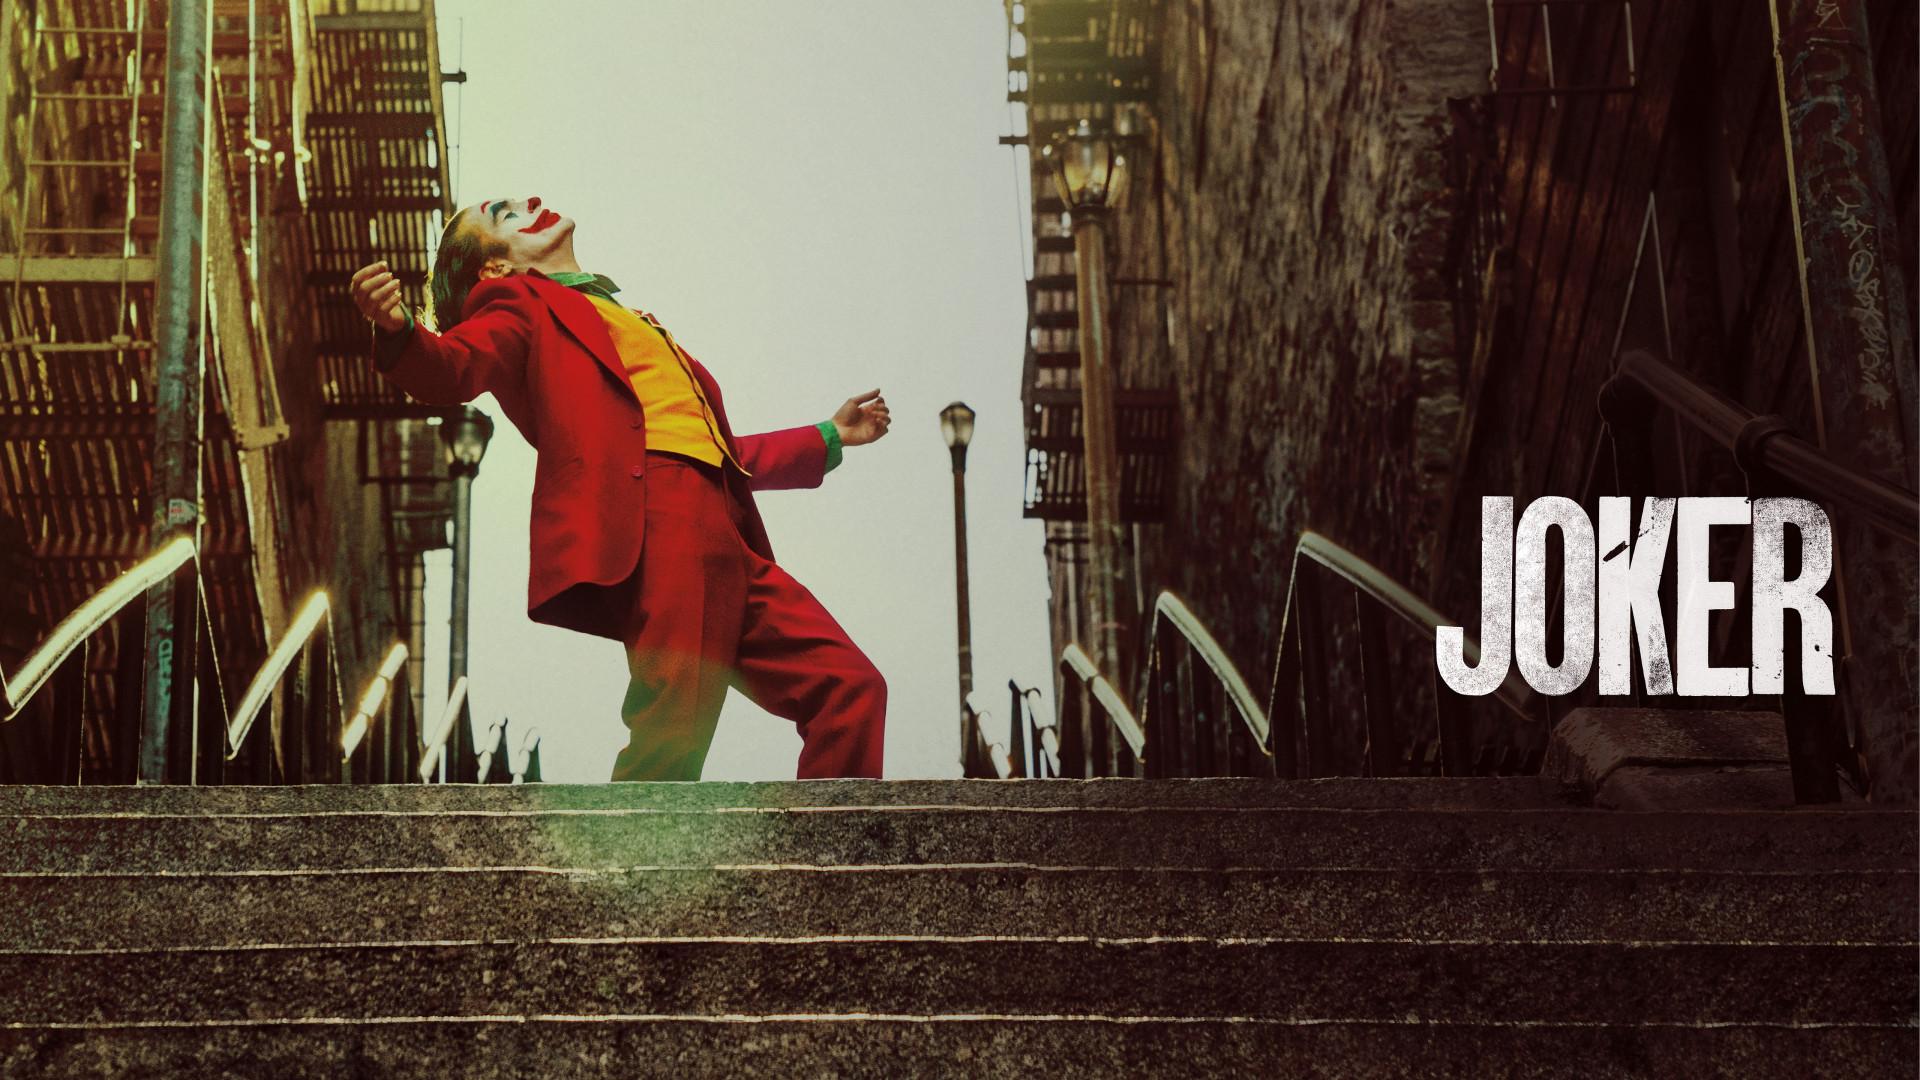 Download Wallpaper Joker 1920x1080